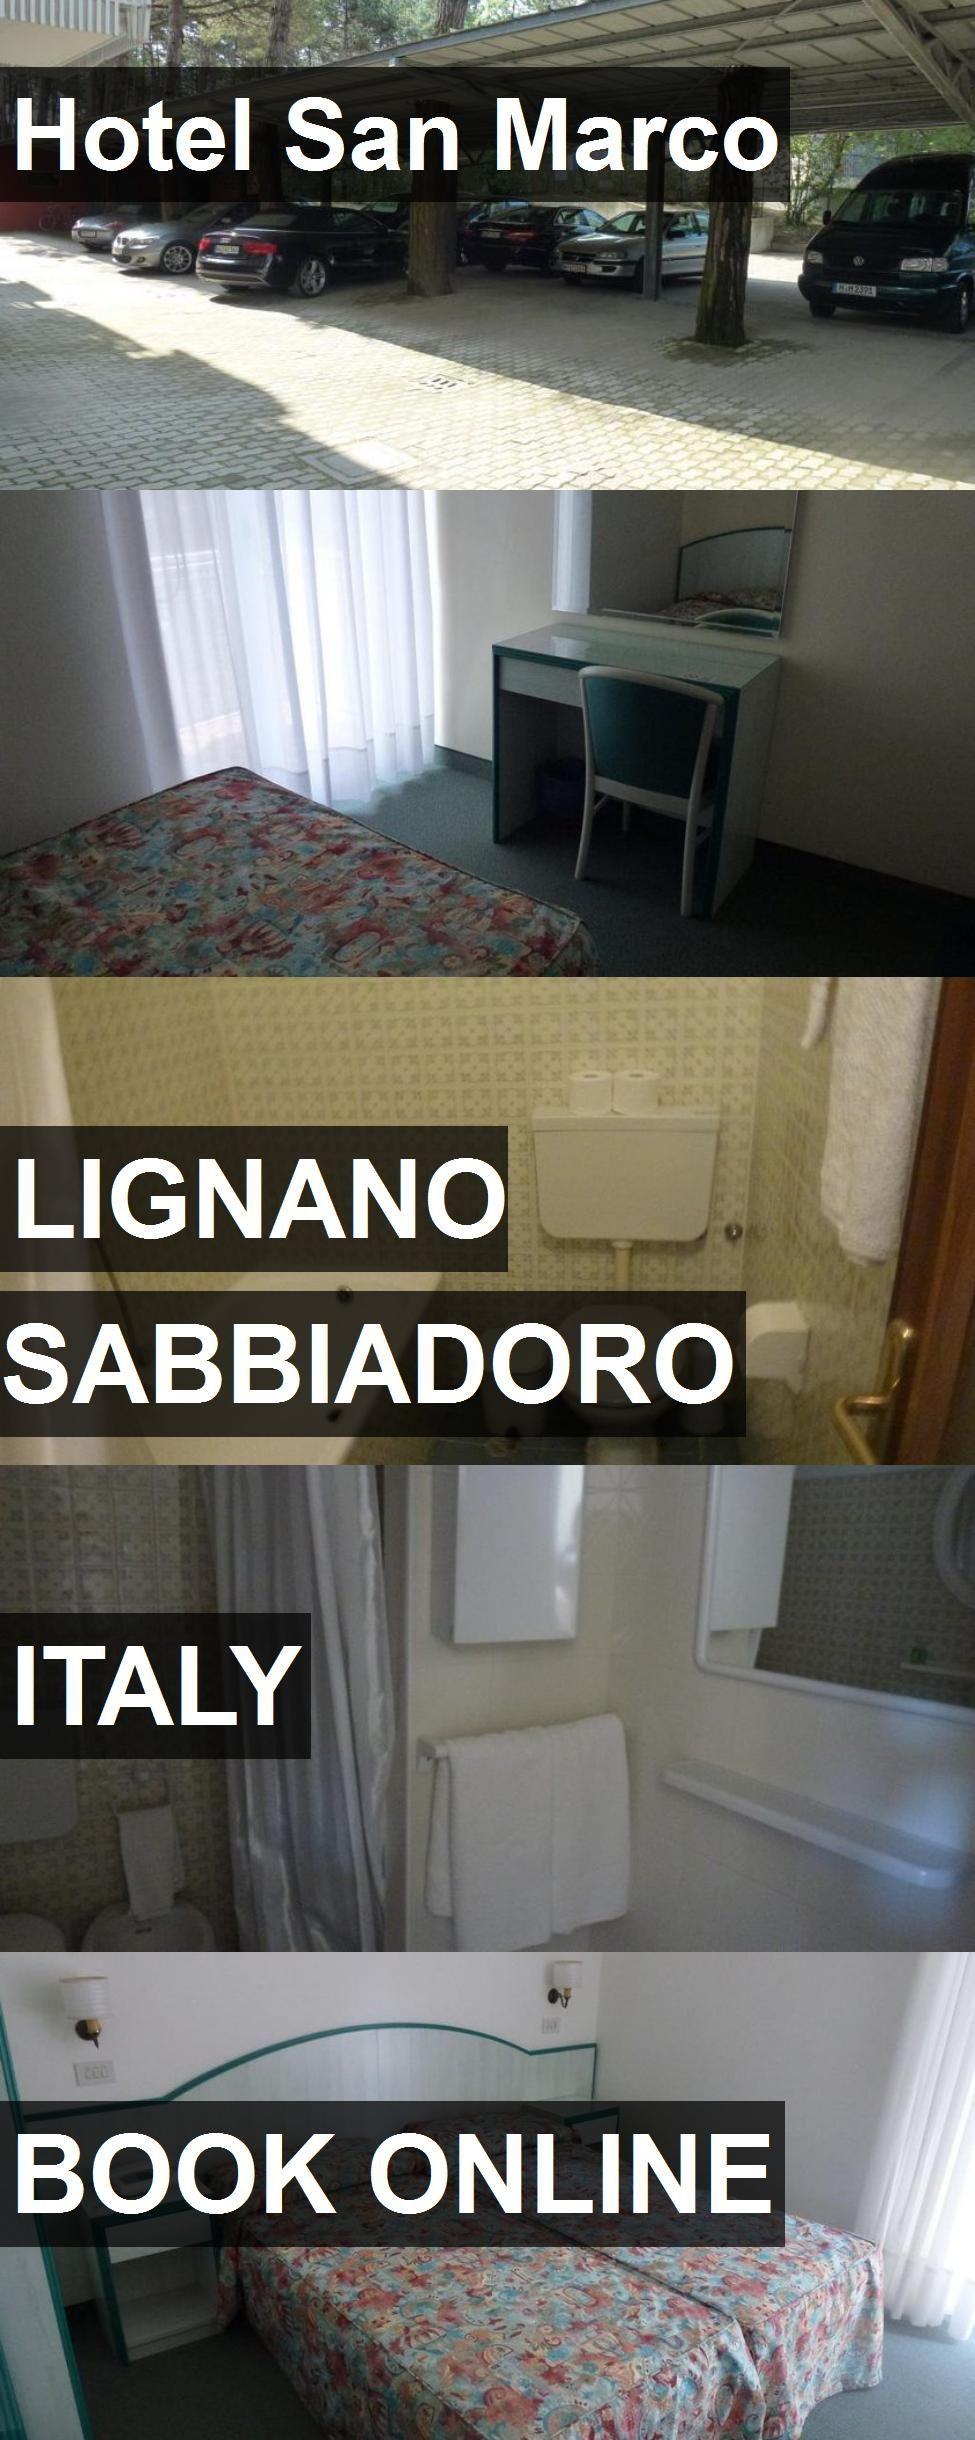 Hotel San Marco in Lignano Sabbiadoro, Italy. For more